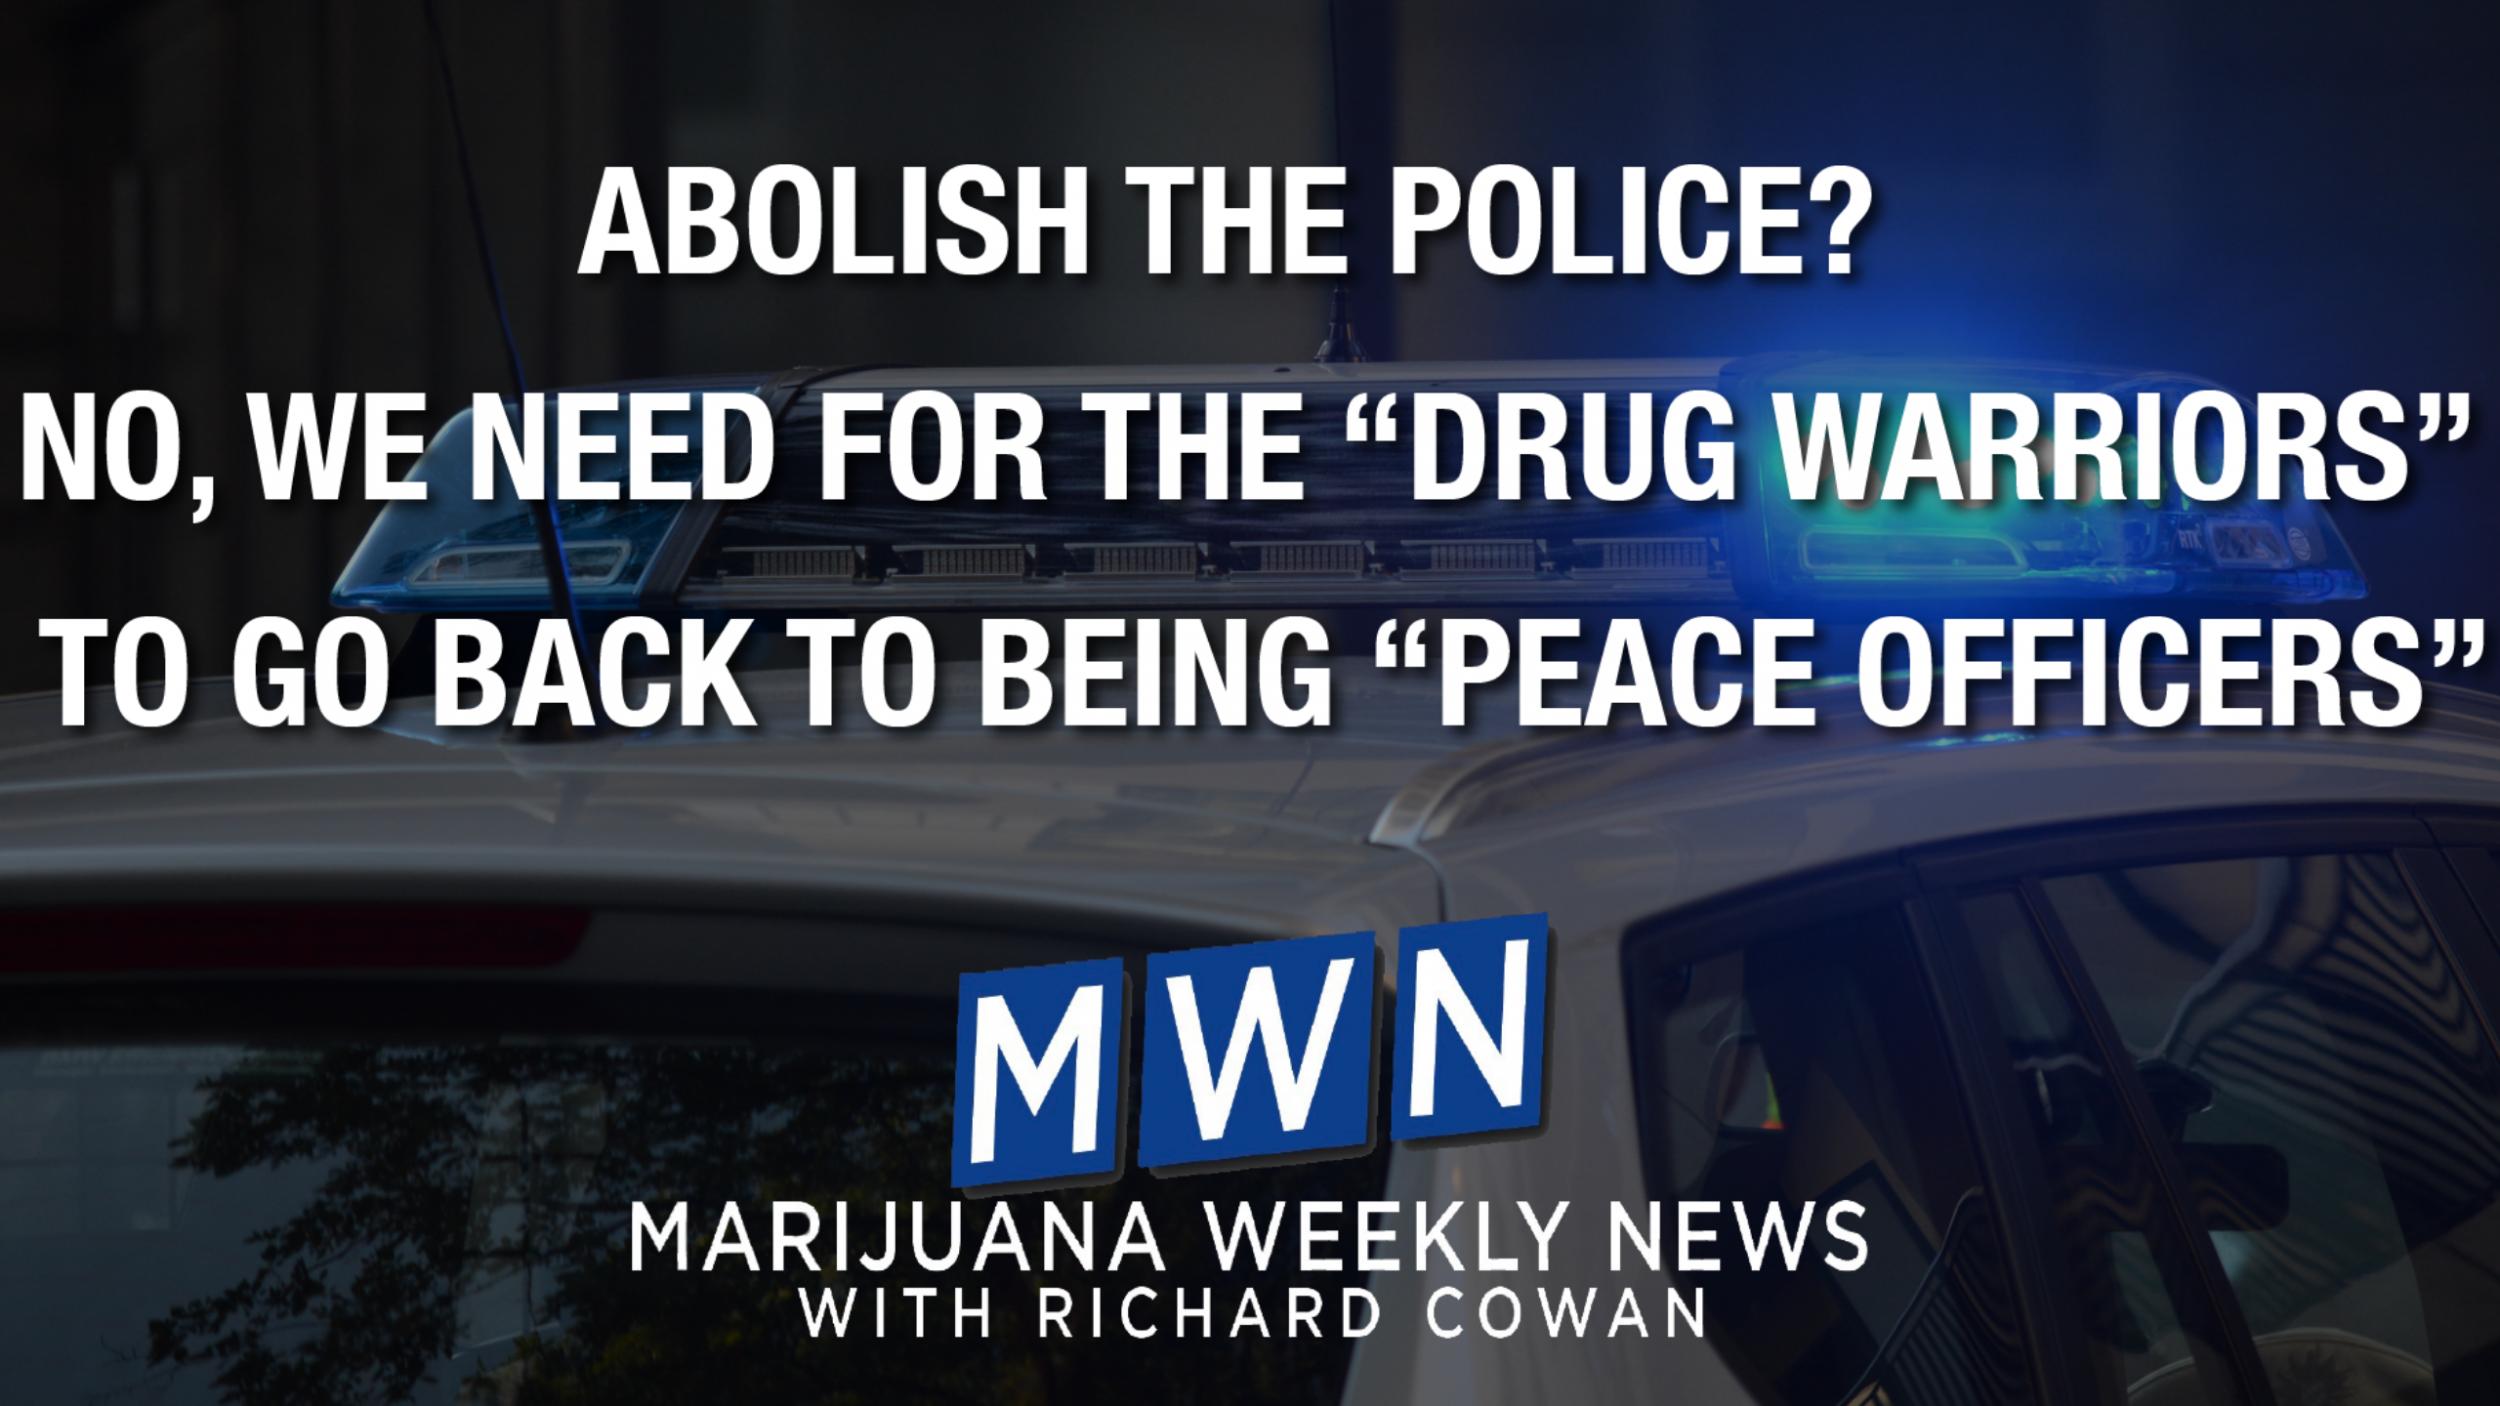 Newsweek AMPLIFY - Abolish the Police?